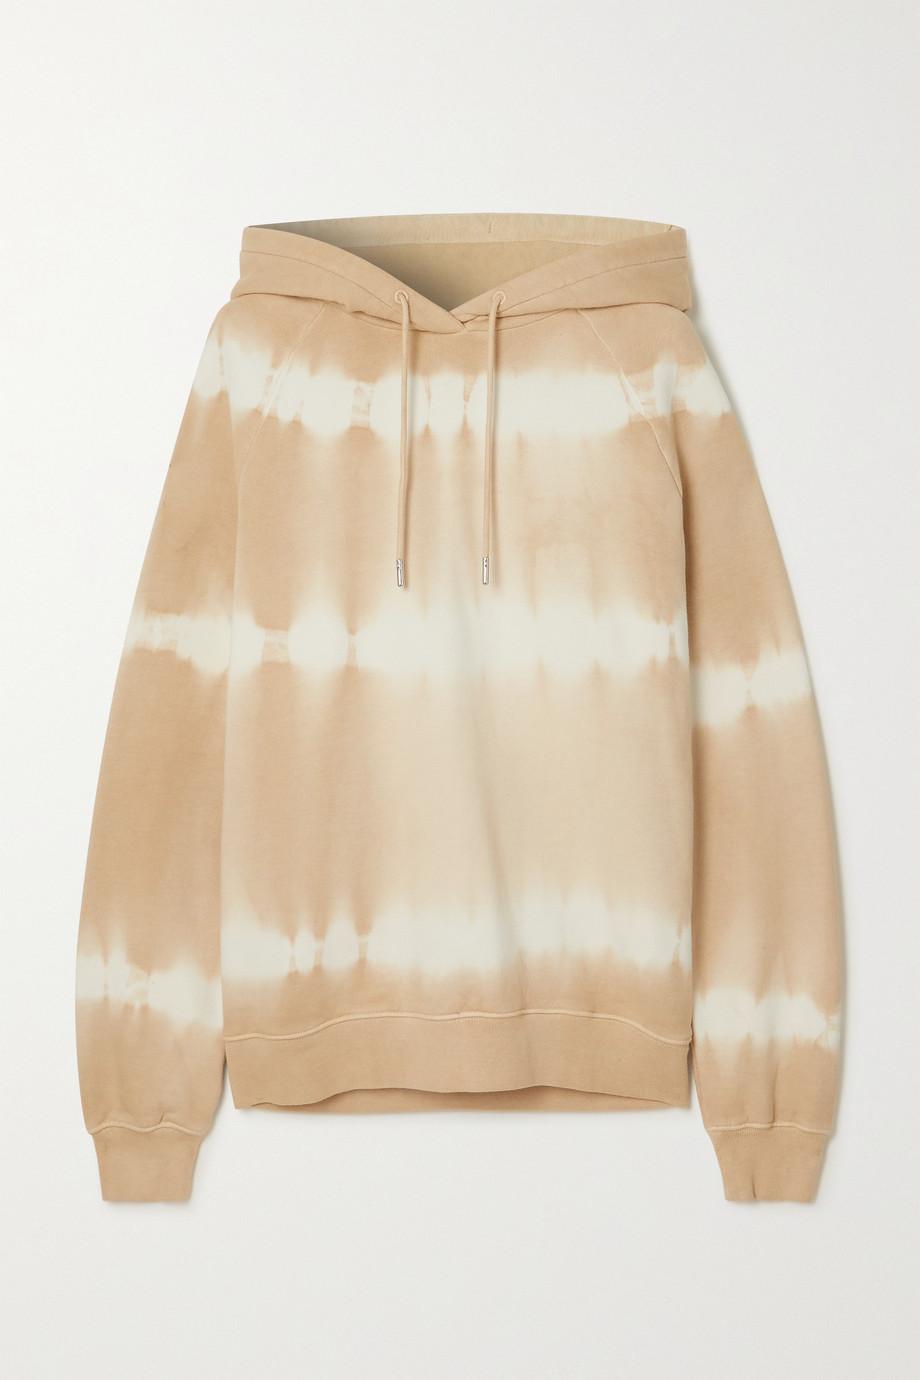 Ninety Percent + NET SUSTAIN tie-dyed organic cotton-jersey hoodie